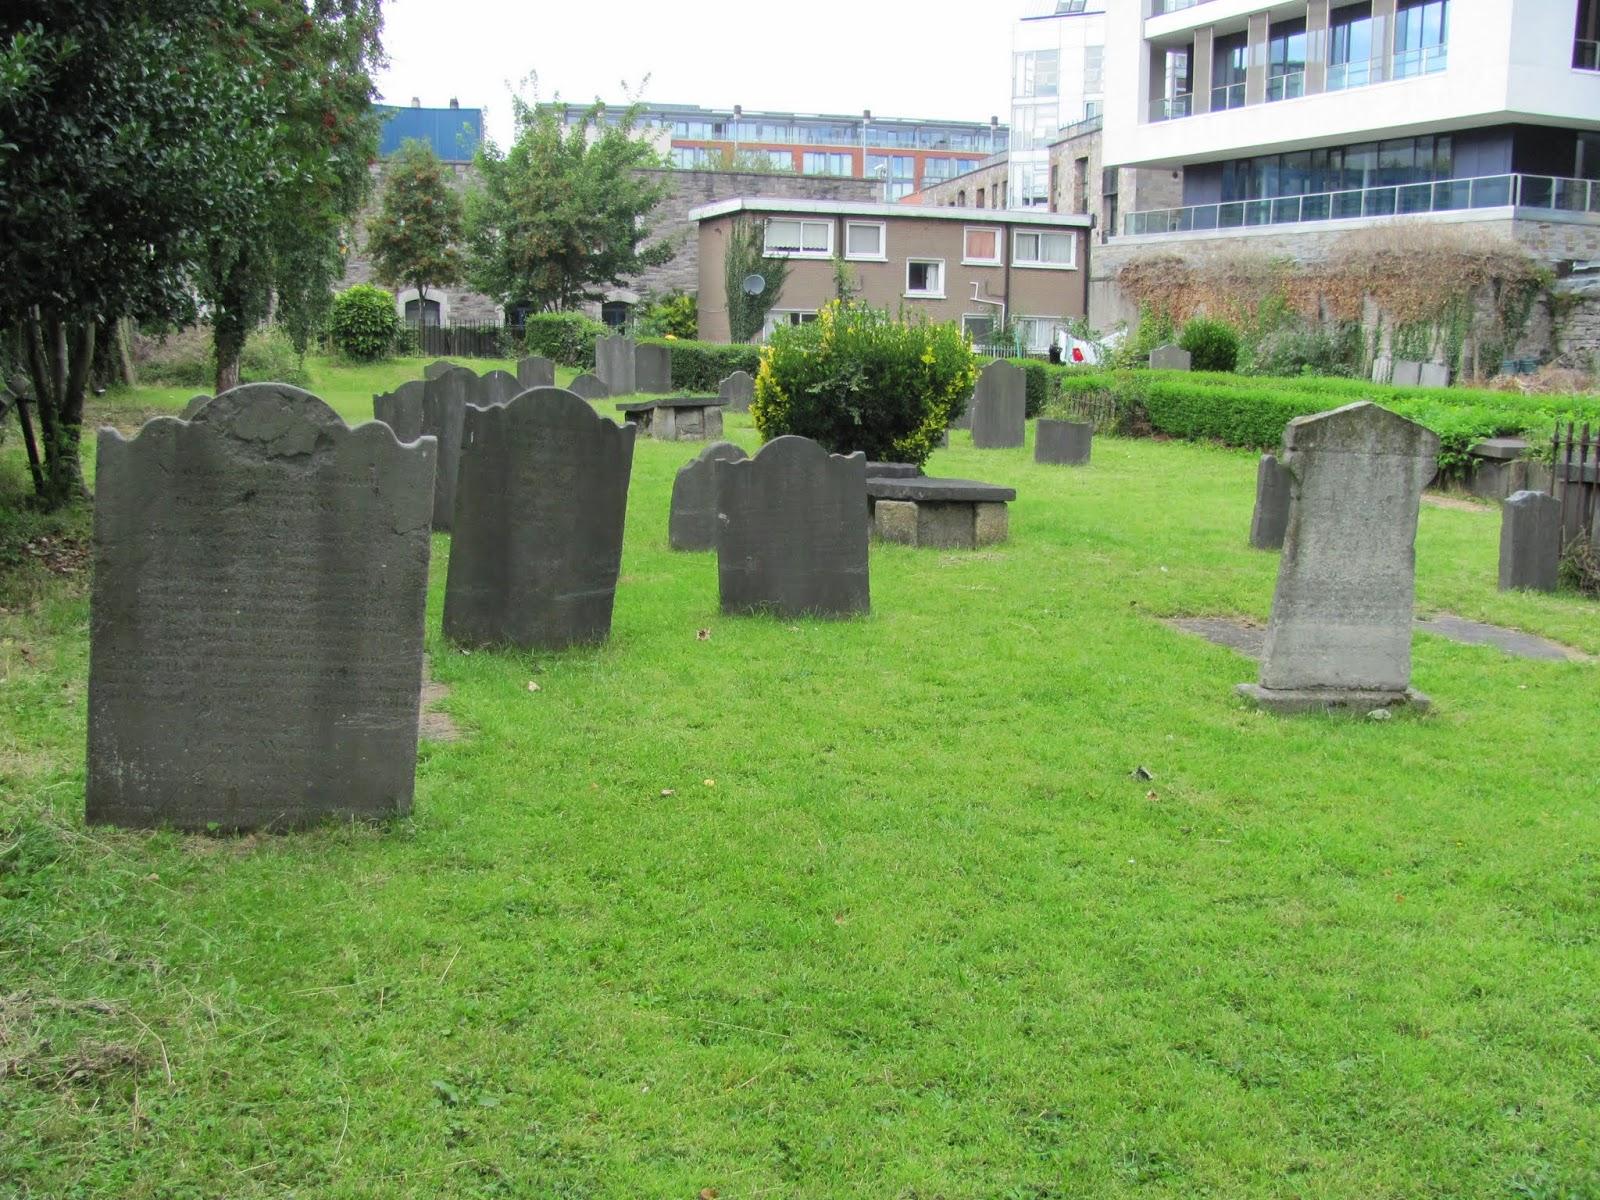 St. Michan's Church Cemetery Dublin, Ireland